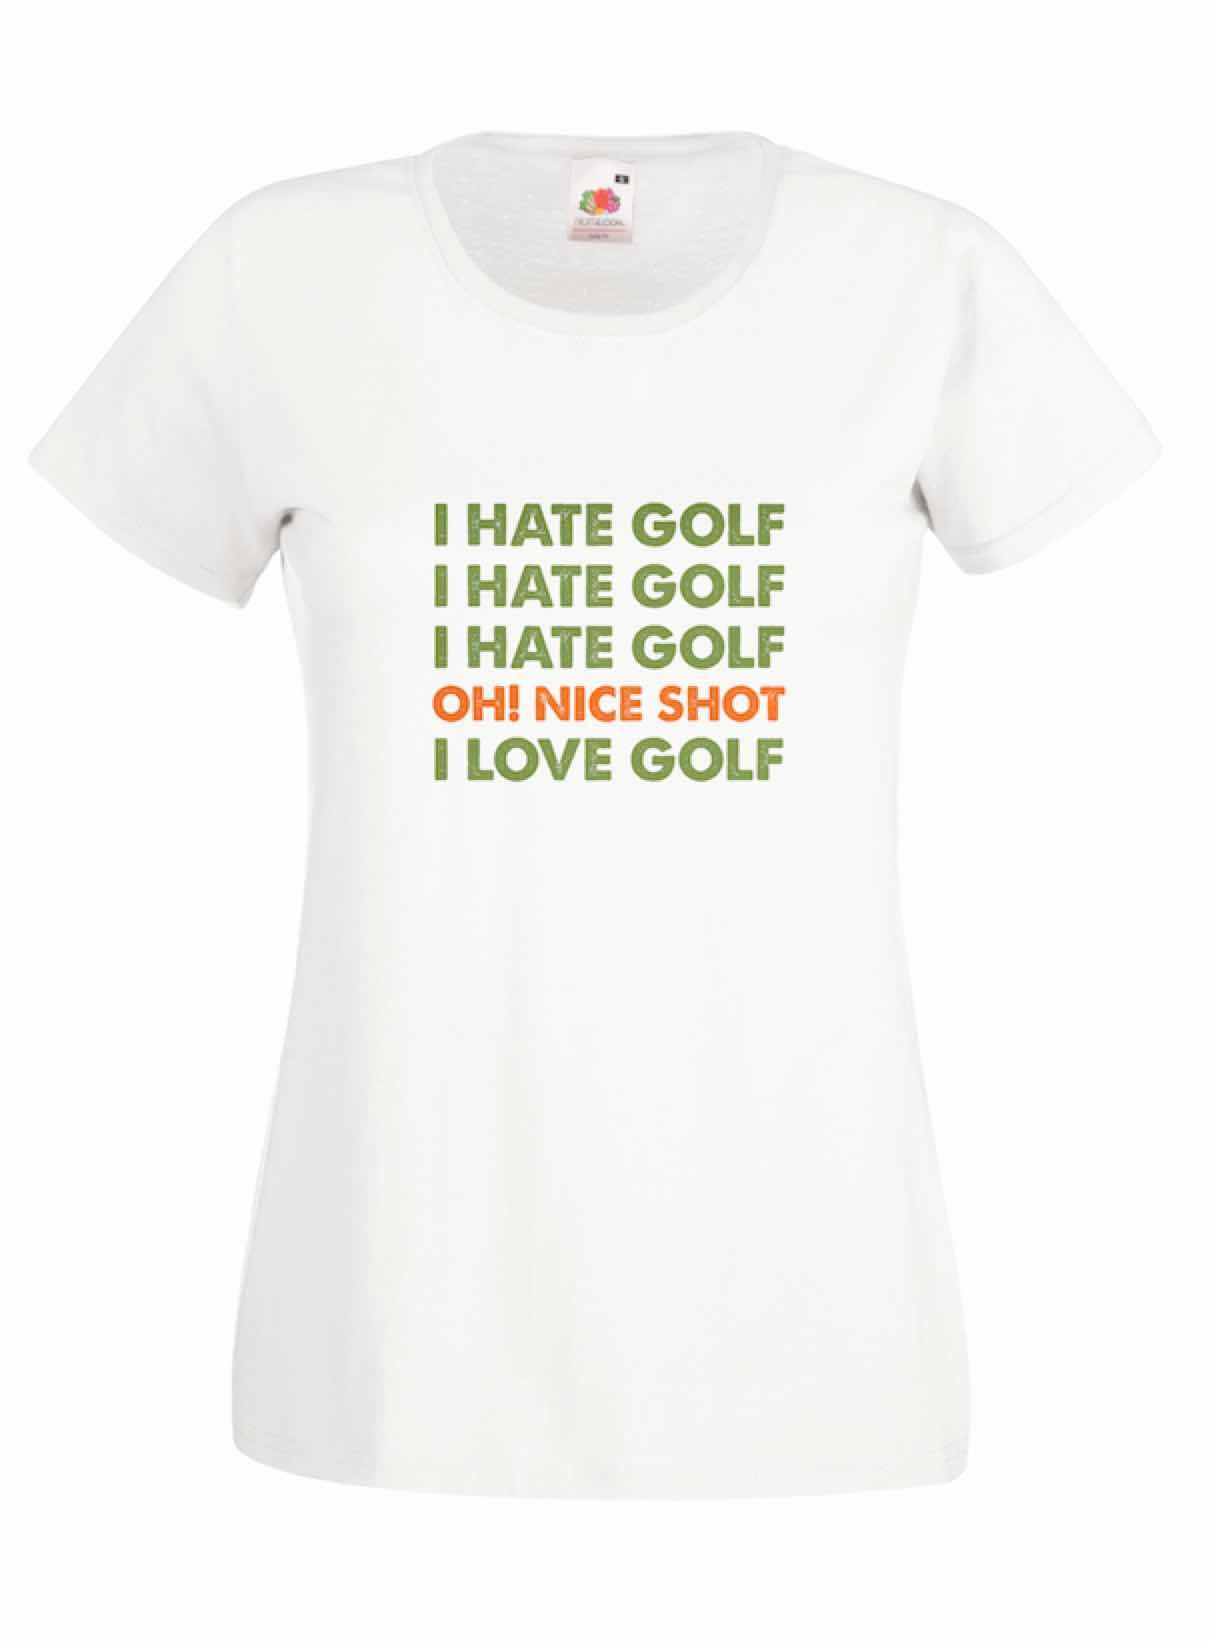 I Hate Golf design for t-shirt, hoodie & sweatshirt